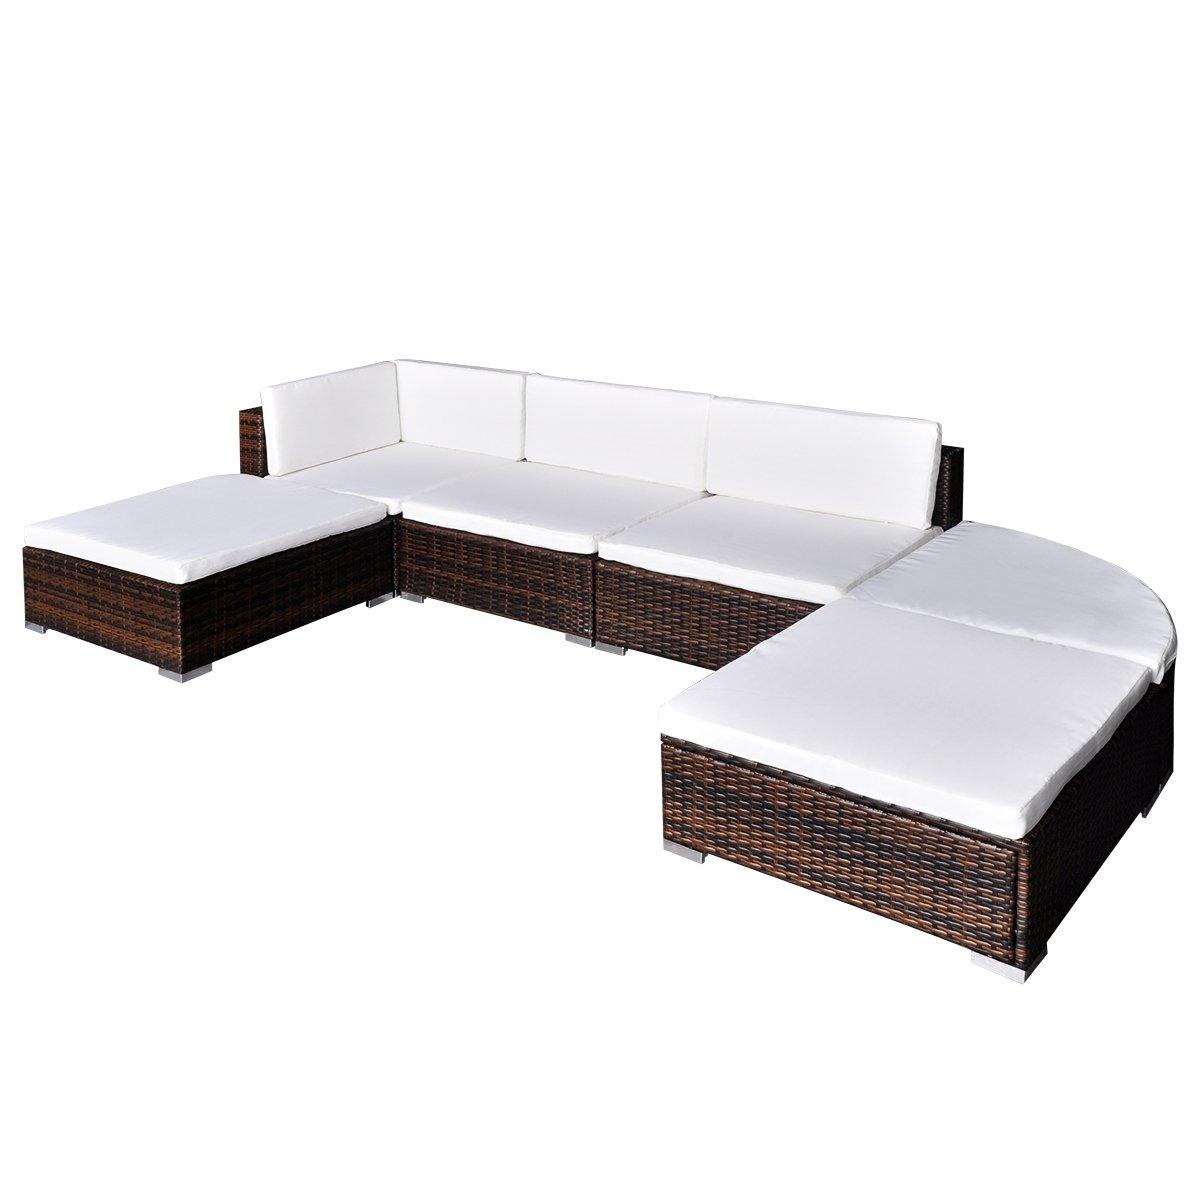 vidaXL Gartenmöbel Poly Rattan Set Lounge Sitzgruppe Braun 16-teilig